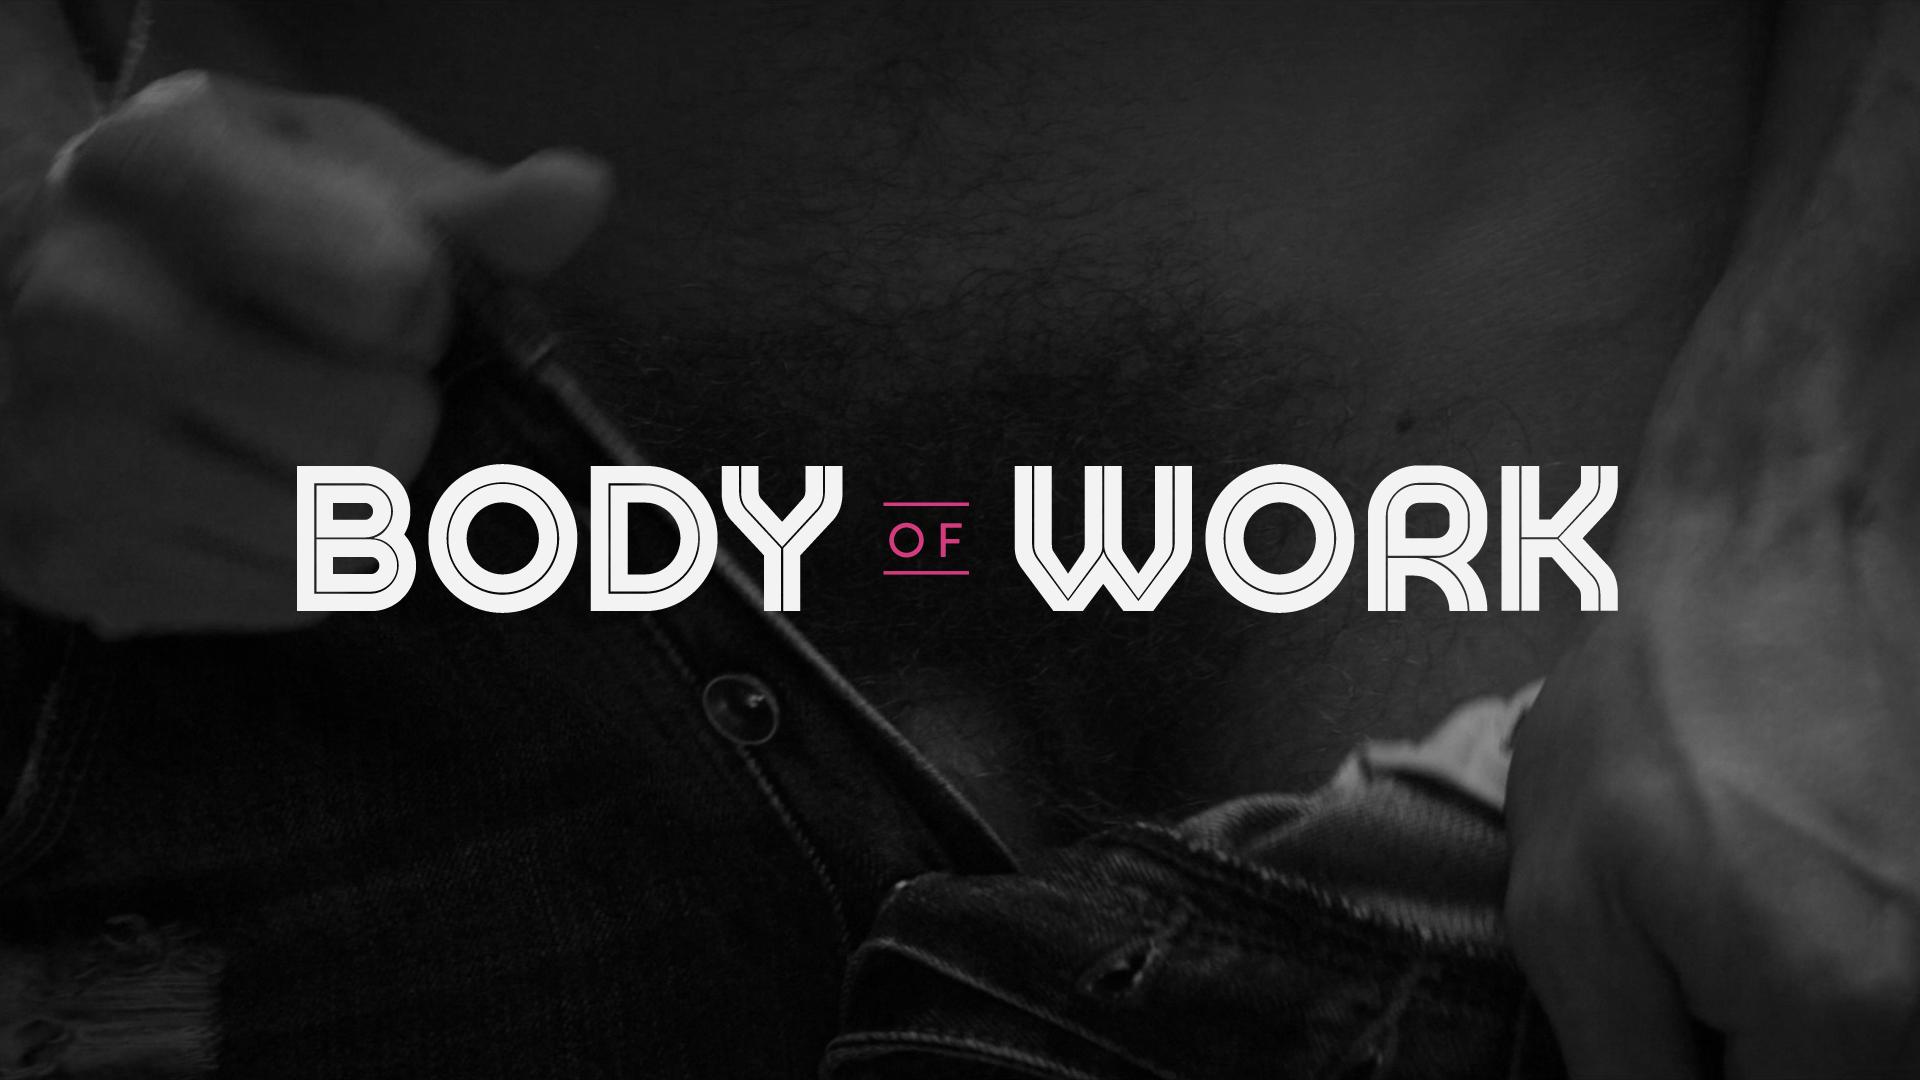 Bodyofwork jamie dornan final 2 large thumbnail 3 override